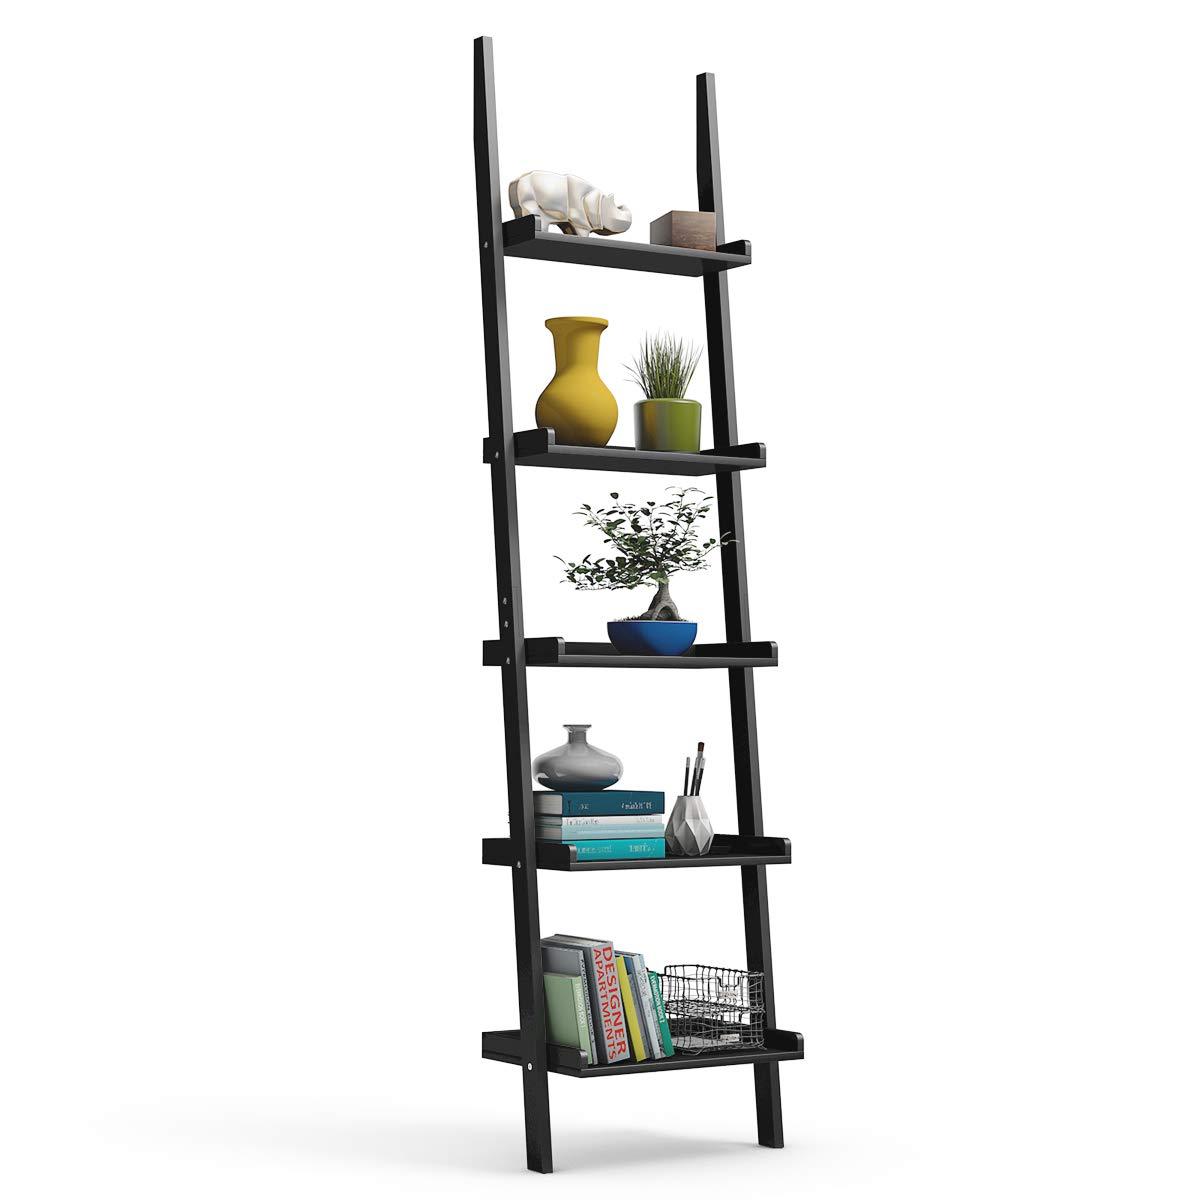 Tangkula Ladder Shelf, 5-Tier Multifunctional Modern Wood Plant Flower Book Display Shelf, Home Office Storage Rack Leaning Ladder Wall Shelf (Black, 1) by Tangkula